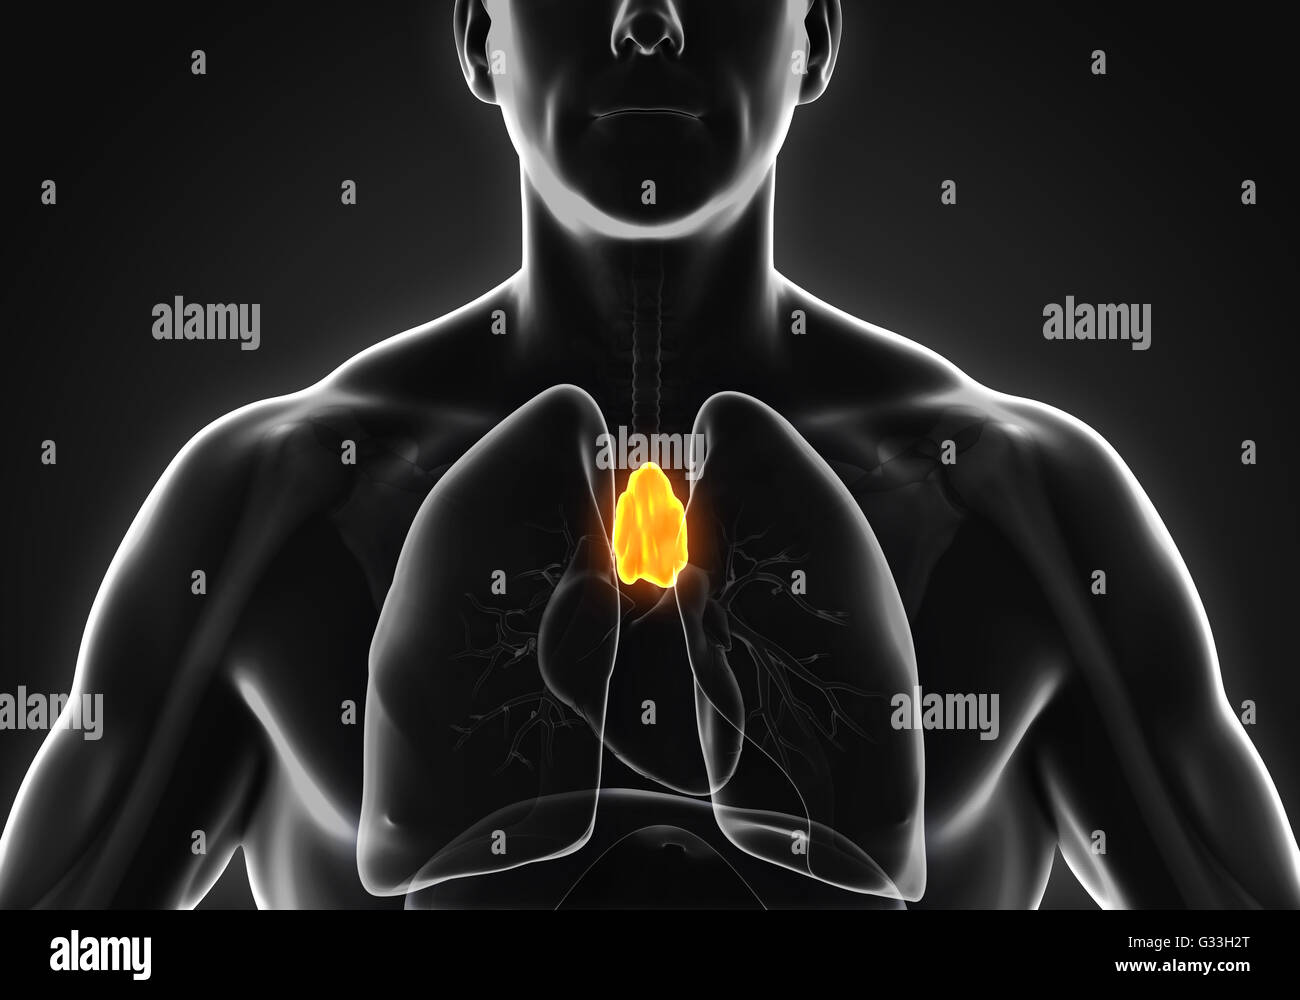 Human Thymus Anatomy Stock Photo: 105185440 - Alamy